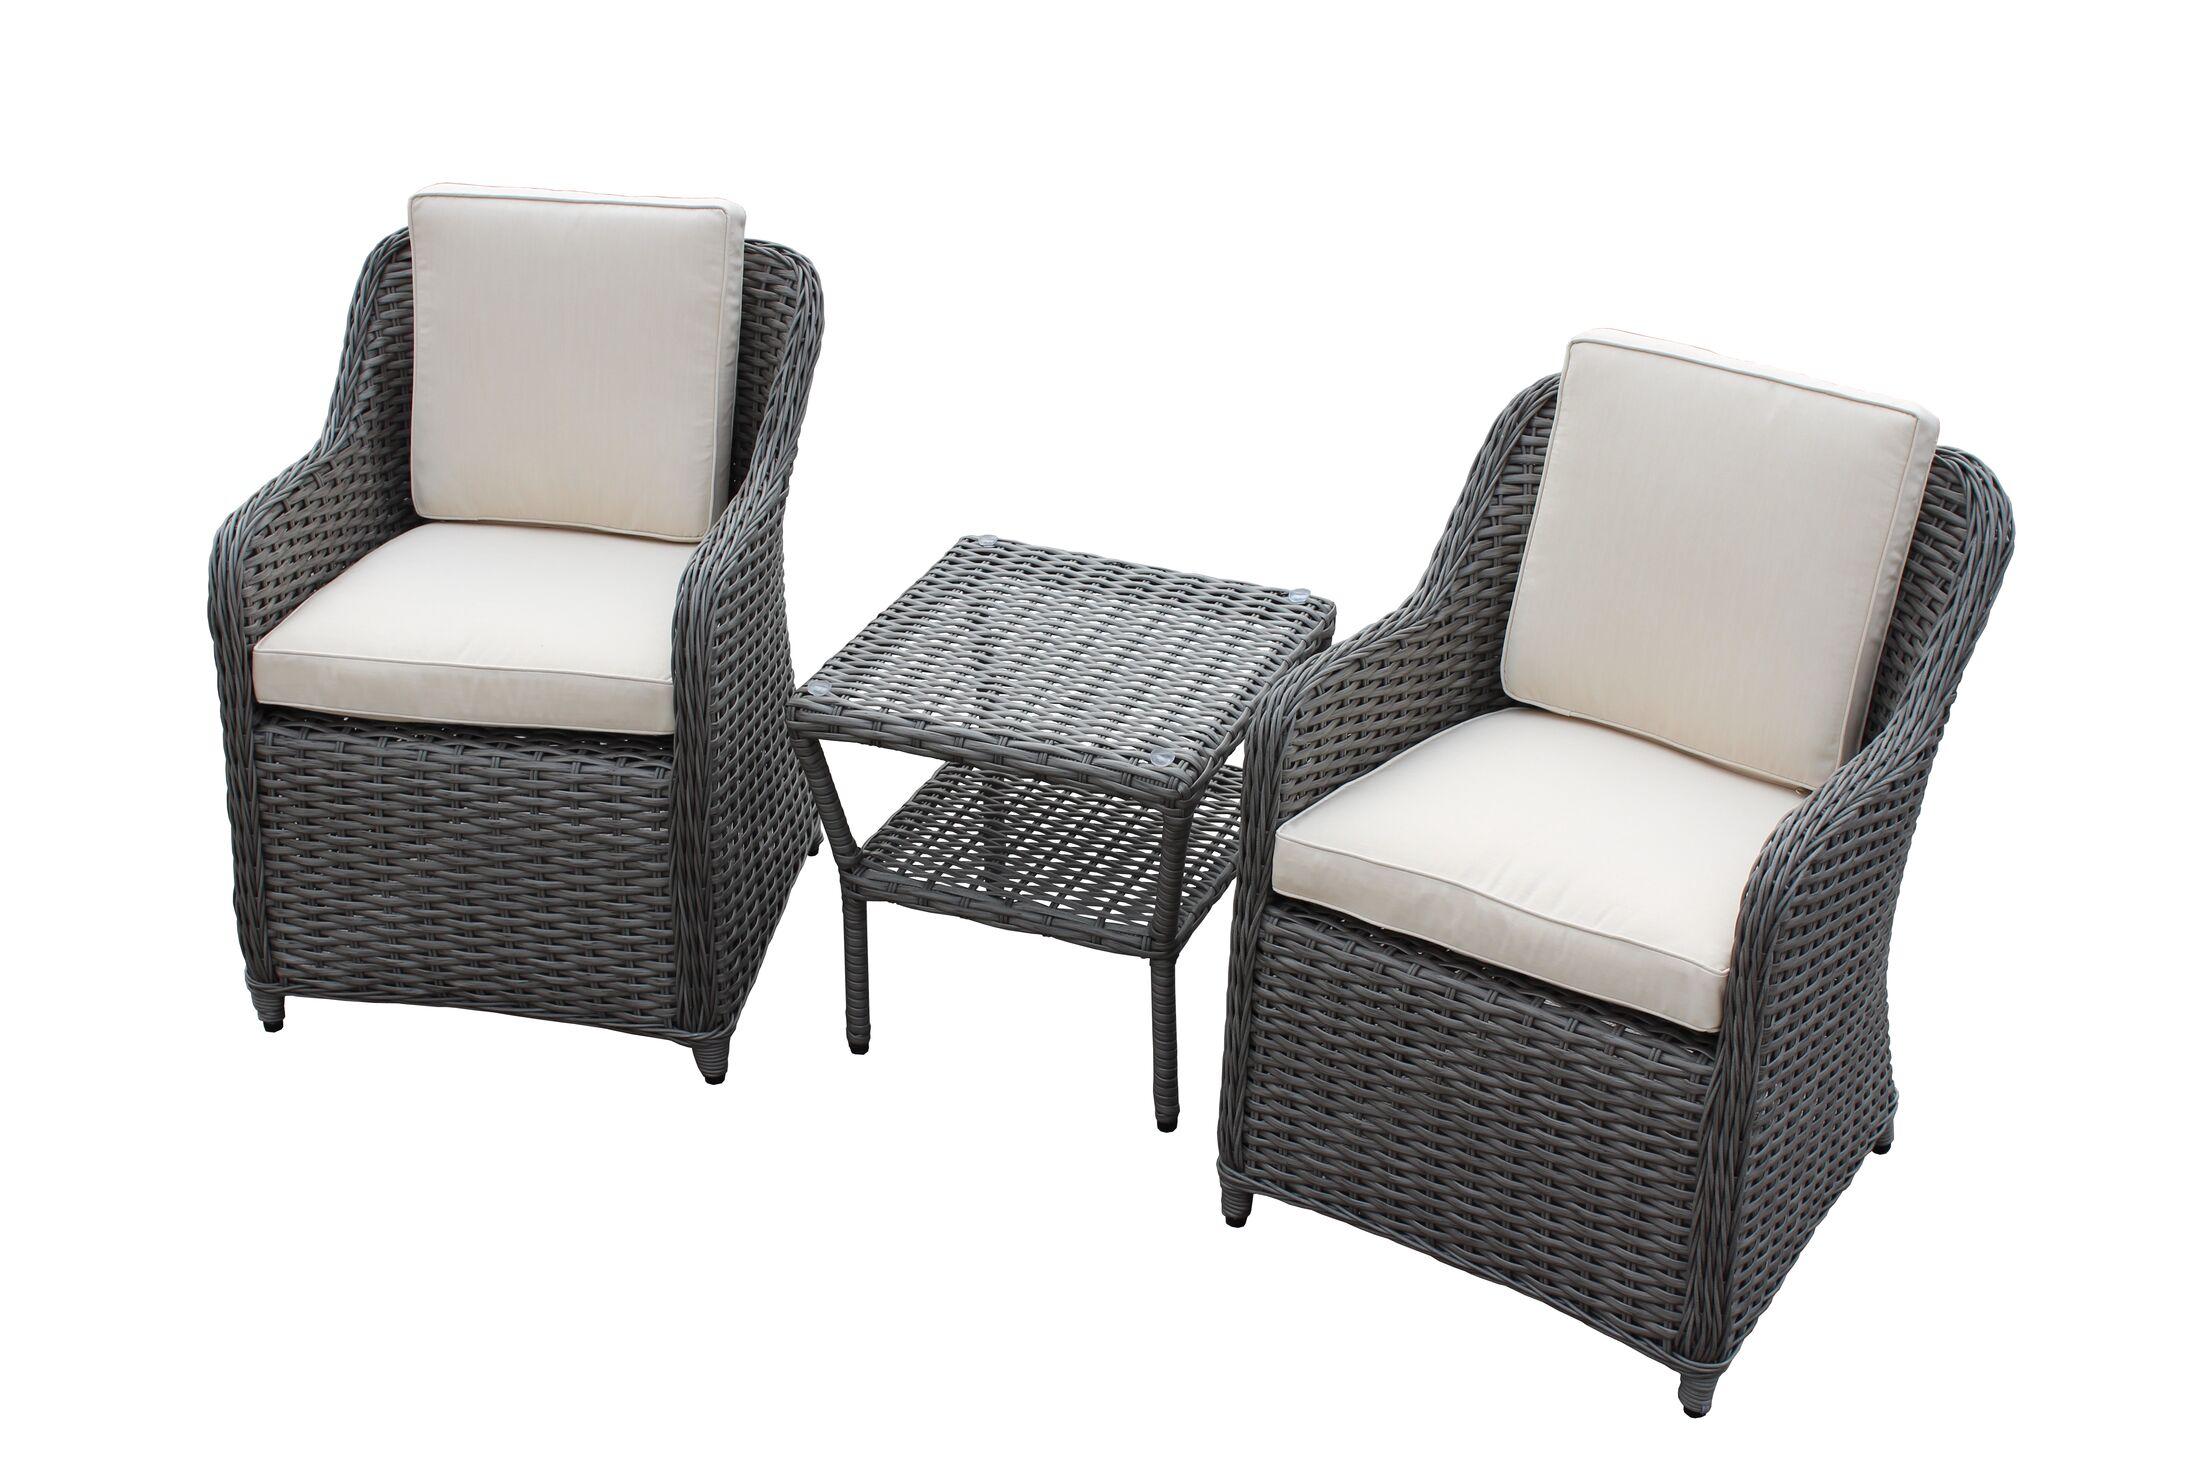 Dutil 3 Piece Rattan Sunbrella Conversation Set with Cushions